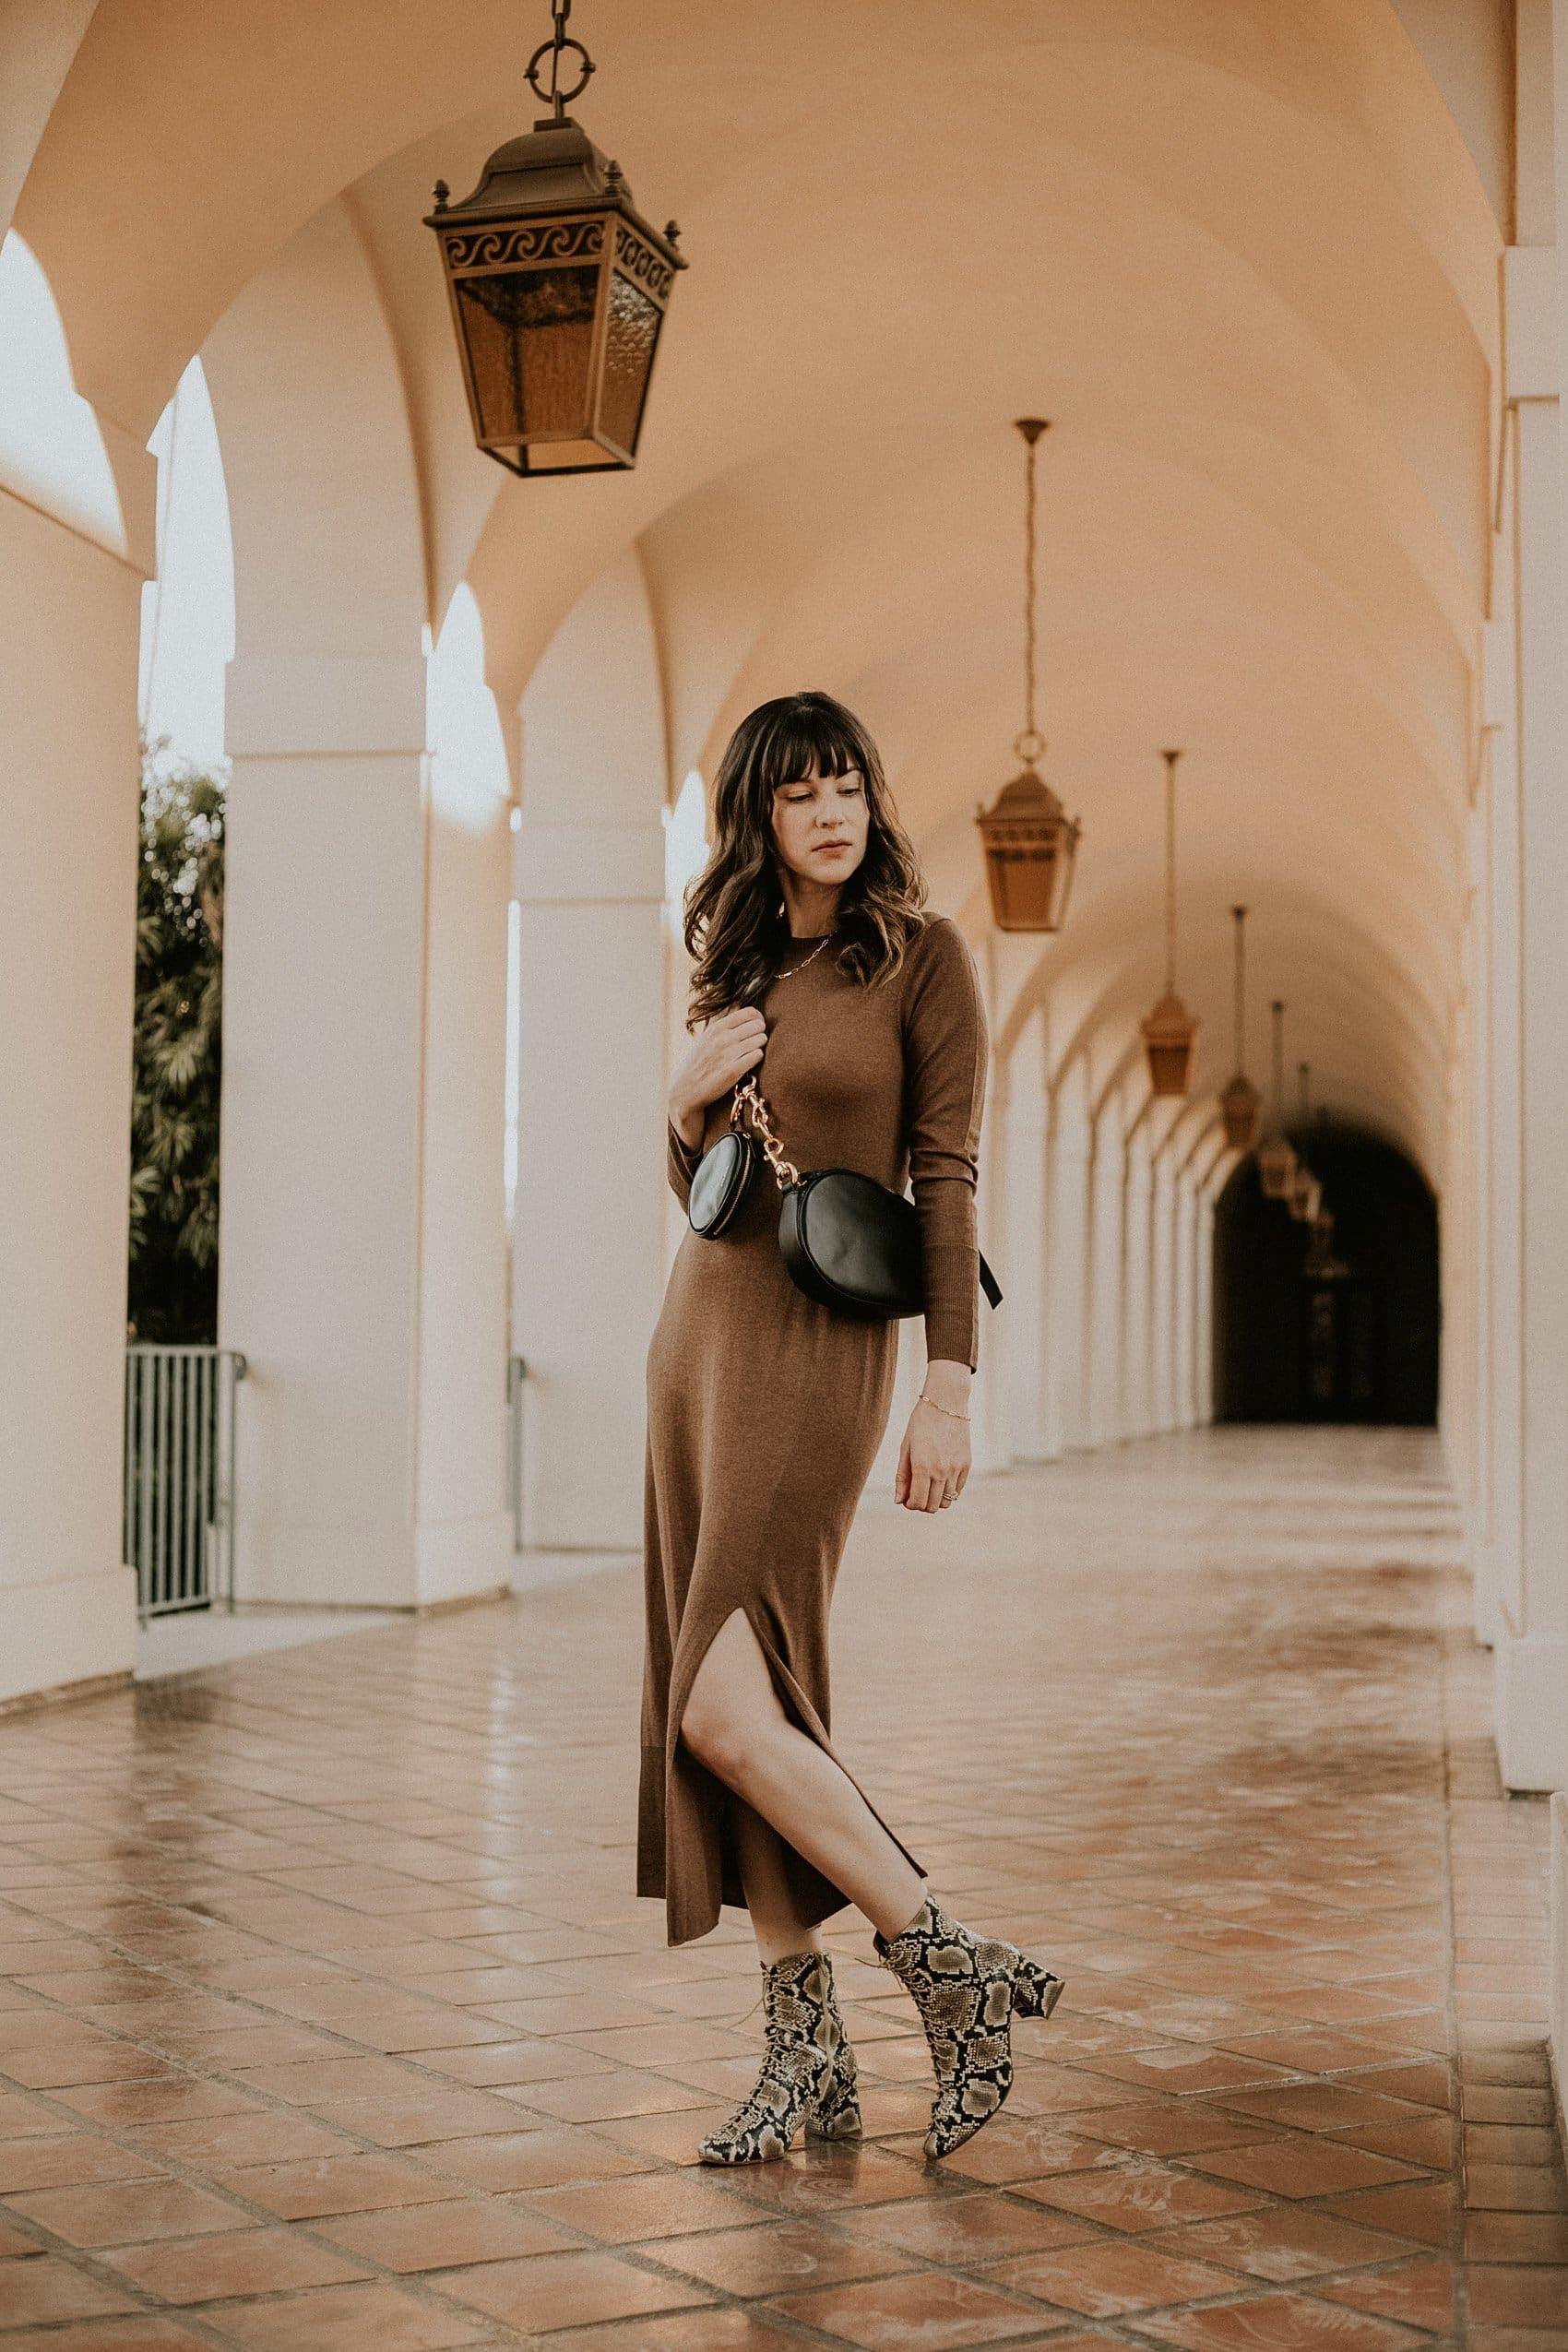 Naadam Dress Review, Lightweight Cashmere Dress with Long Sleeves and Reike Nen Bag